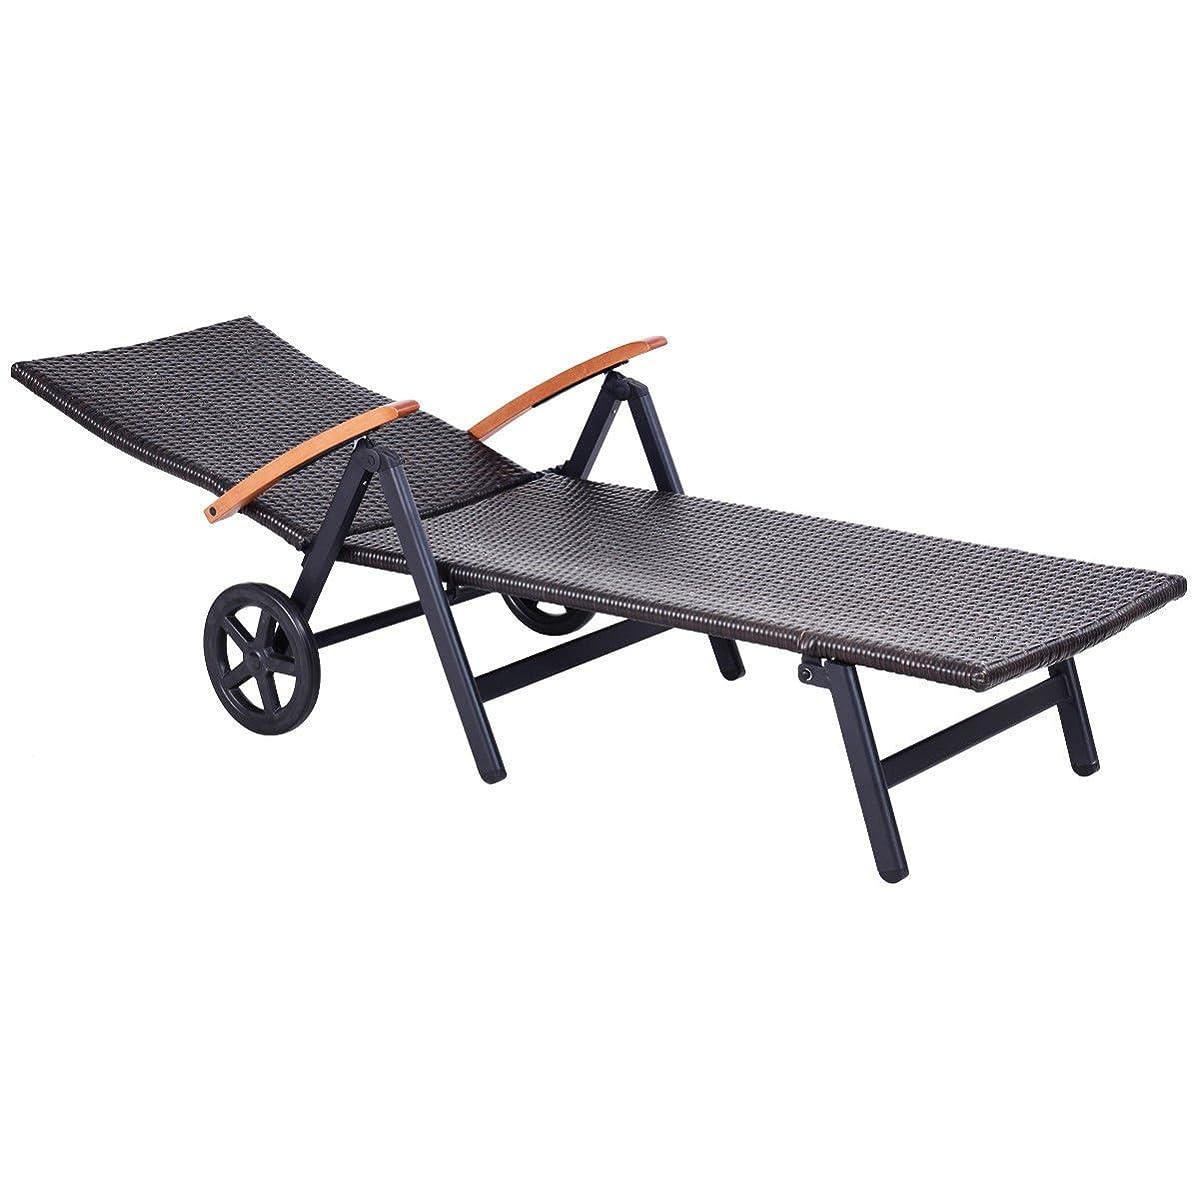 Item Valley Folding Back Adjustable Aluminum Rattan Lounge Recliner Chair W/Wheels Brown